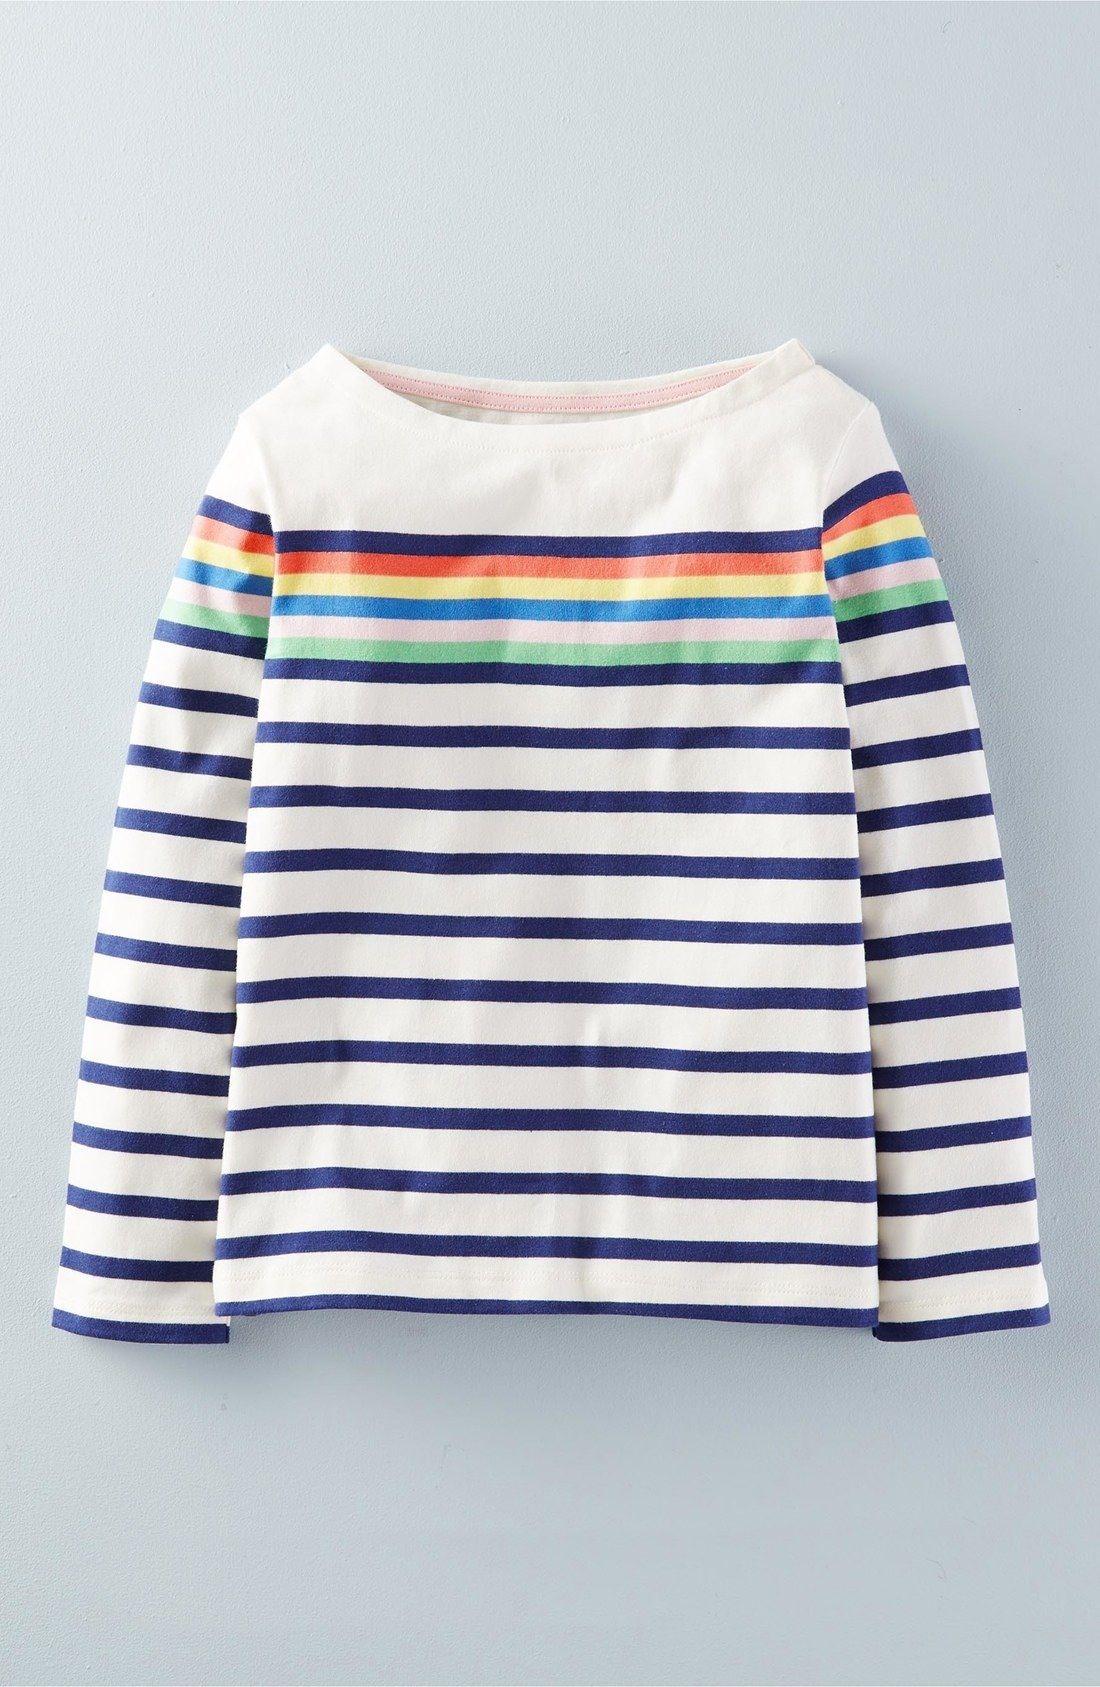 Mini Boden girls fun print Breton long sleeve top shirt rainbow stars stripe